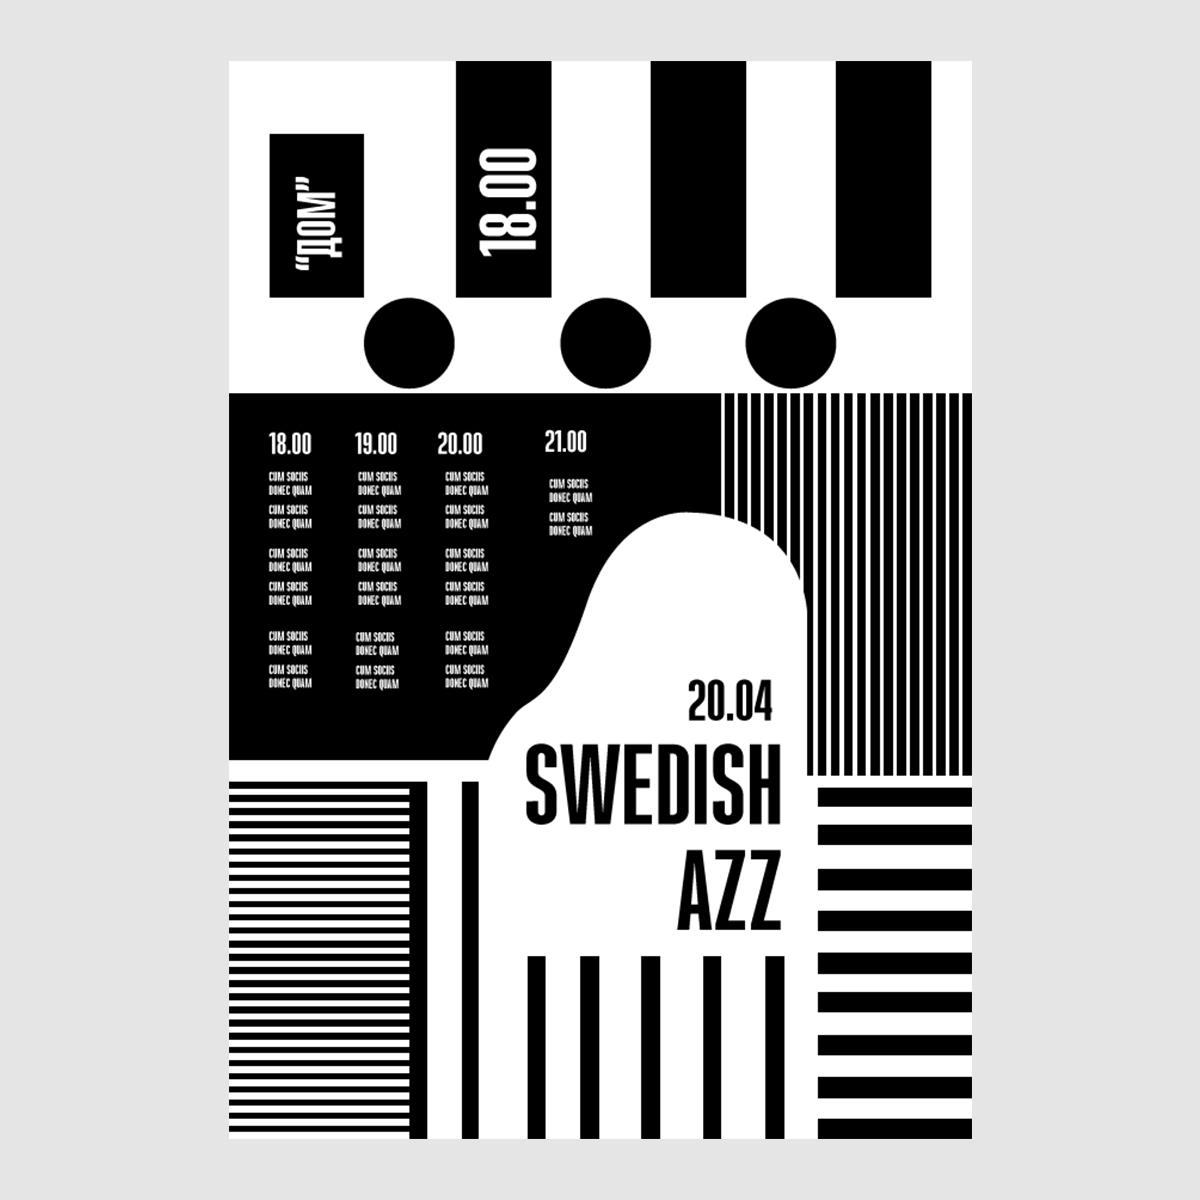 постер, swedish azz